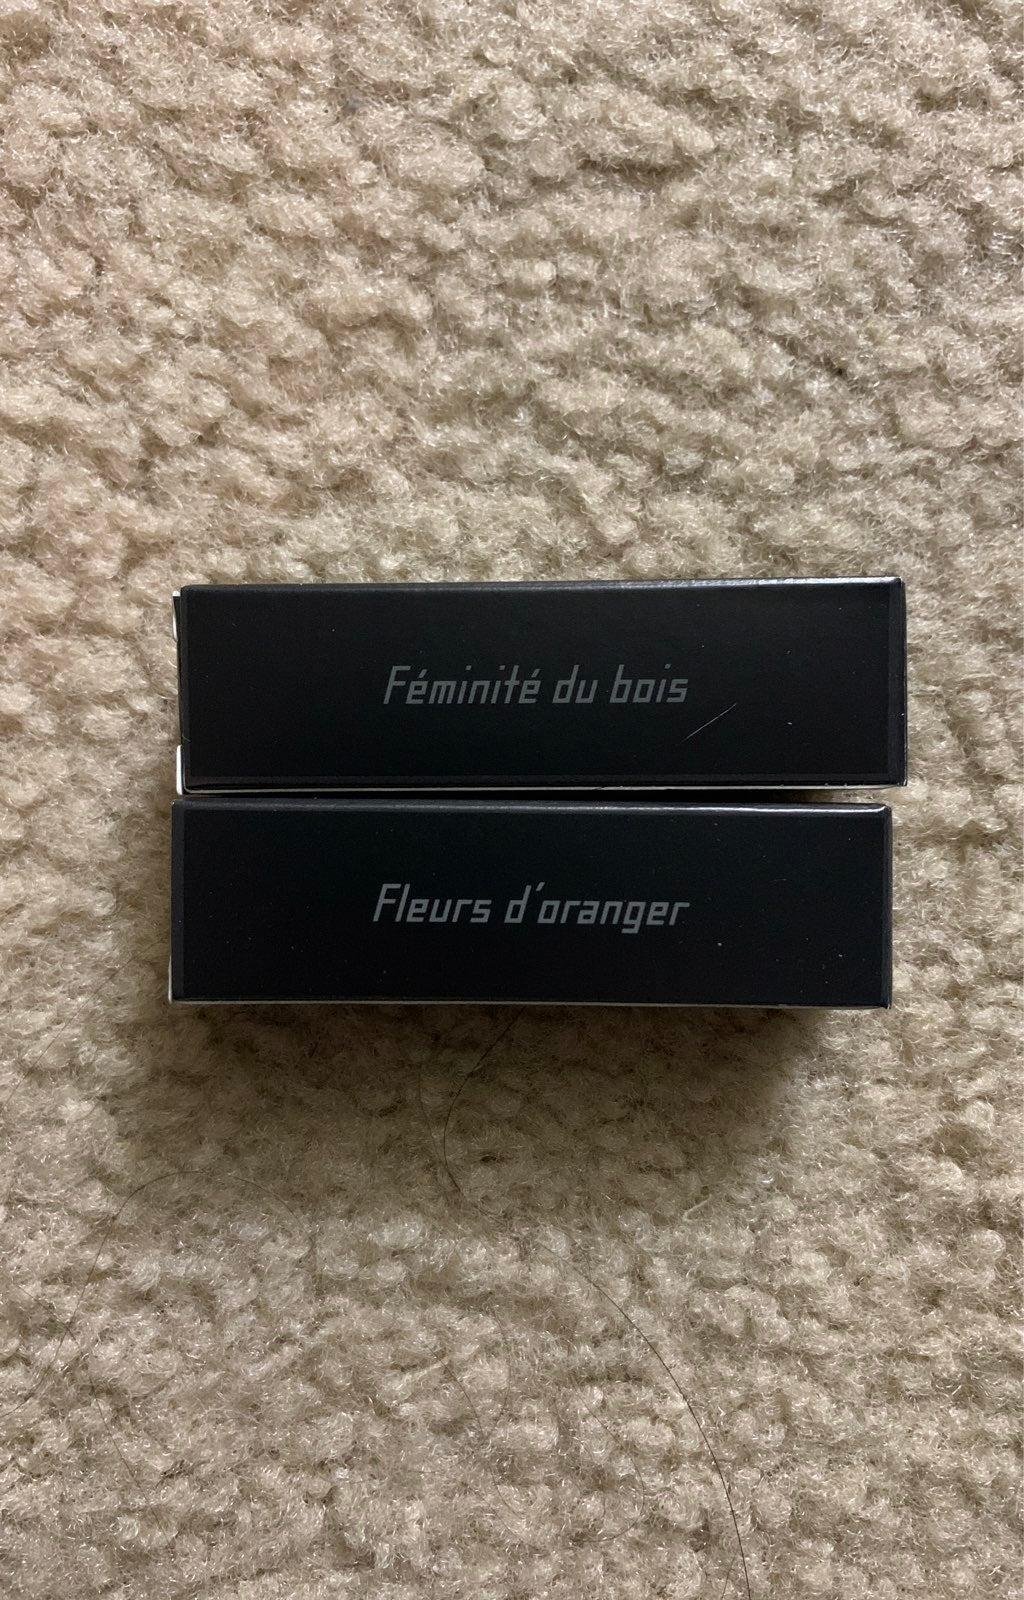 Serge lutens perfume samples set